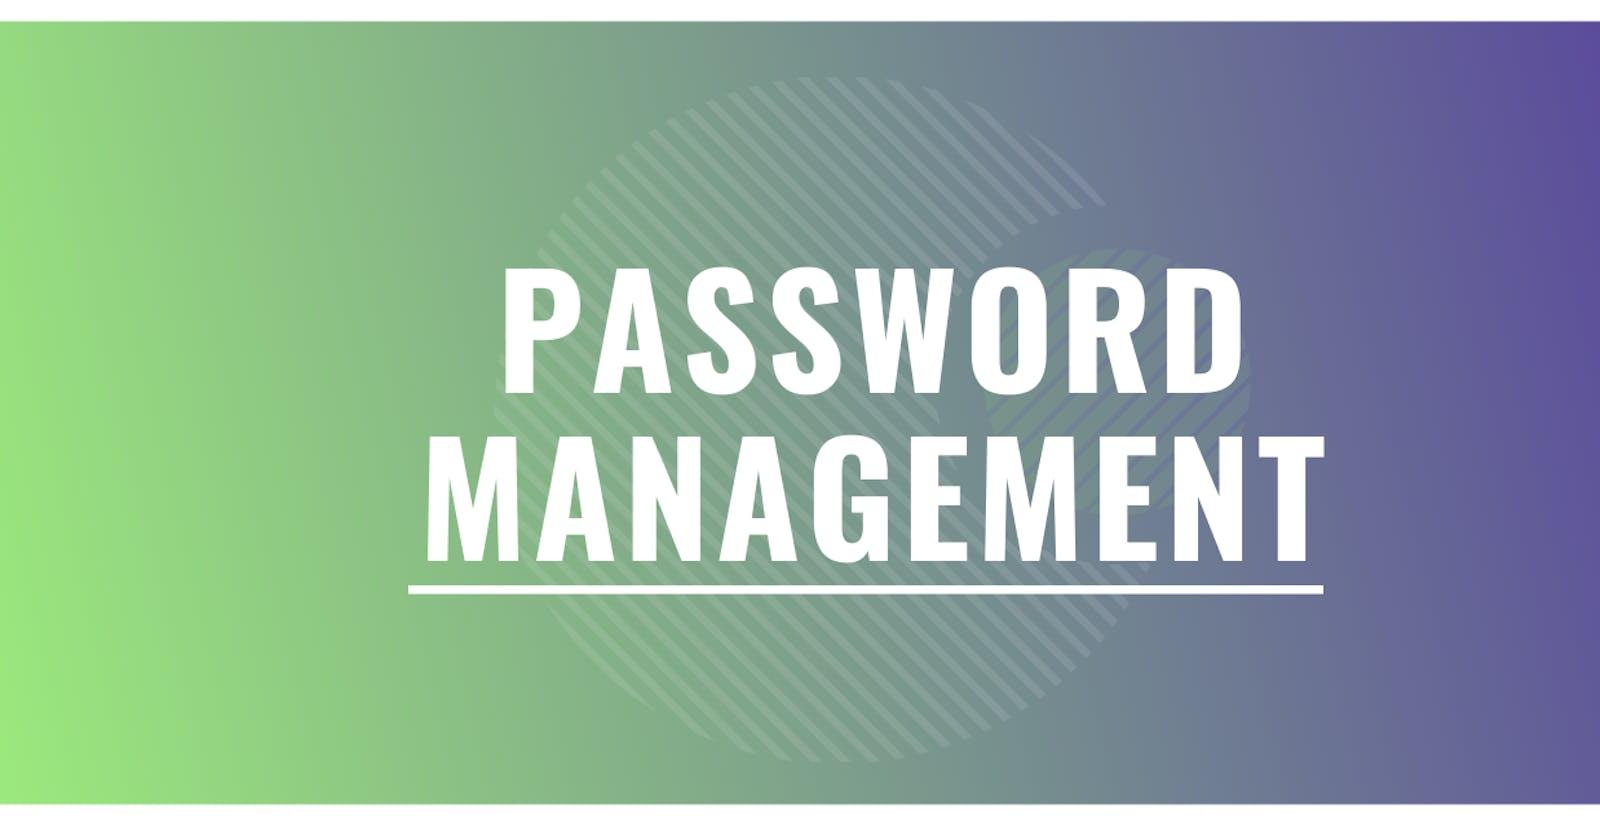 My Password management Journey